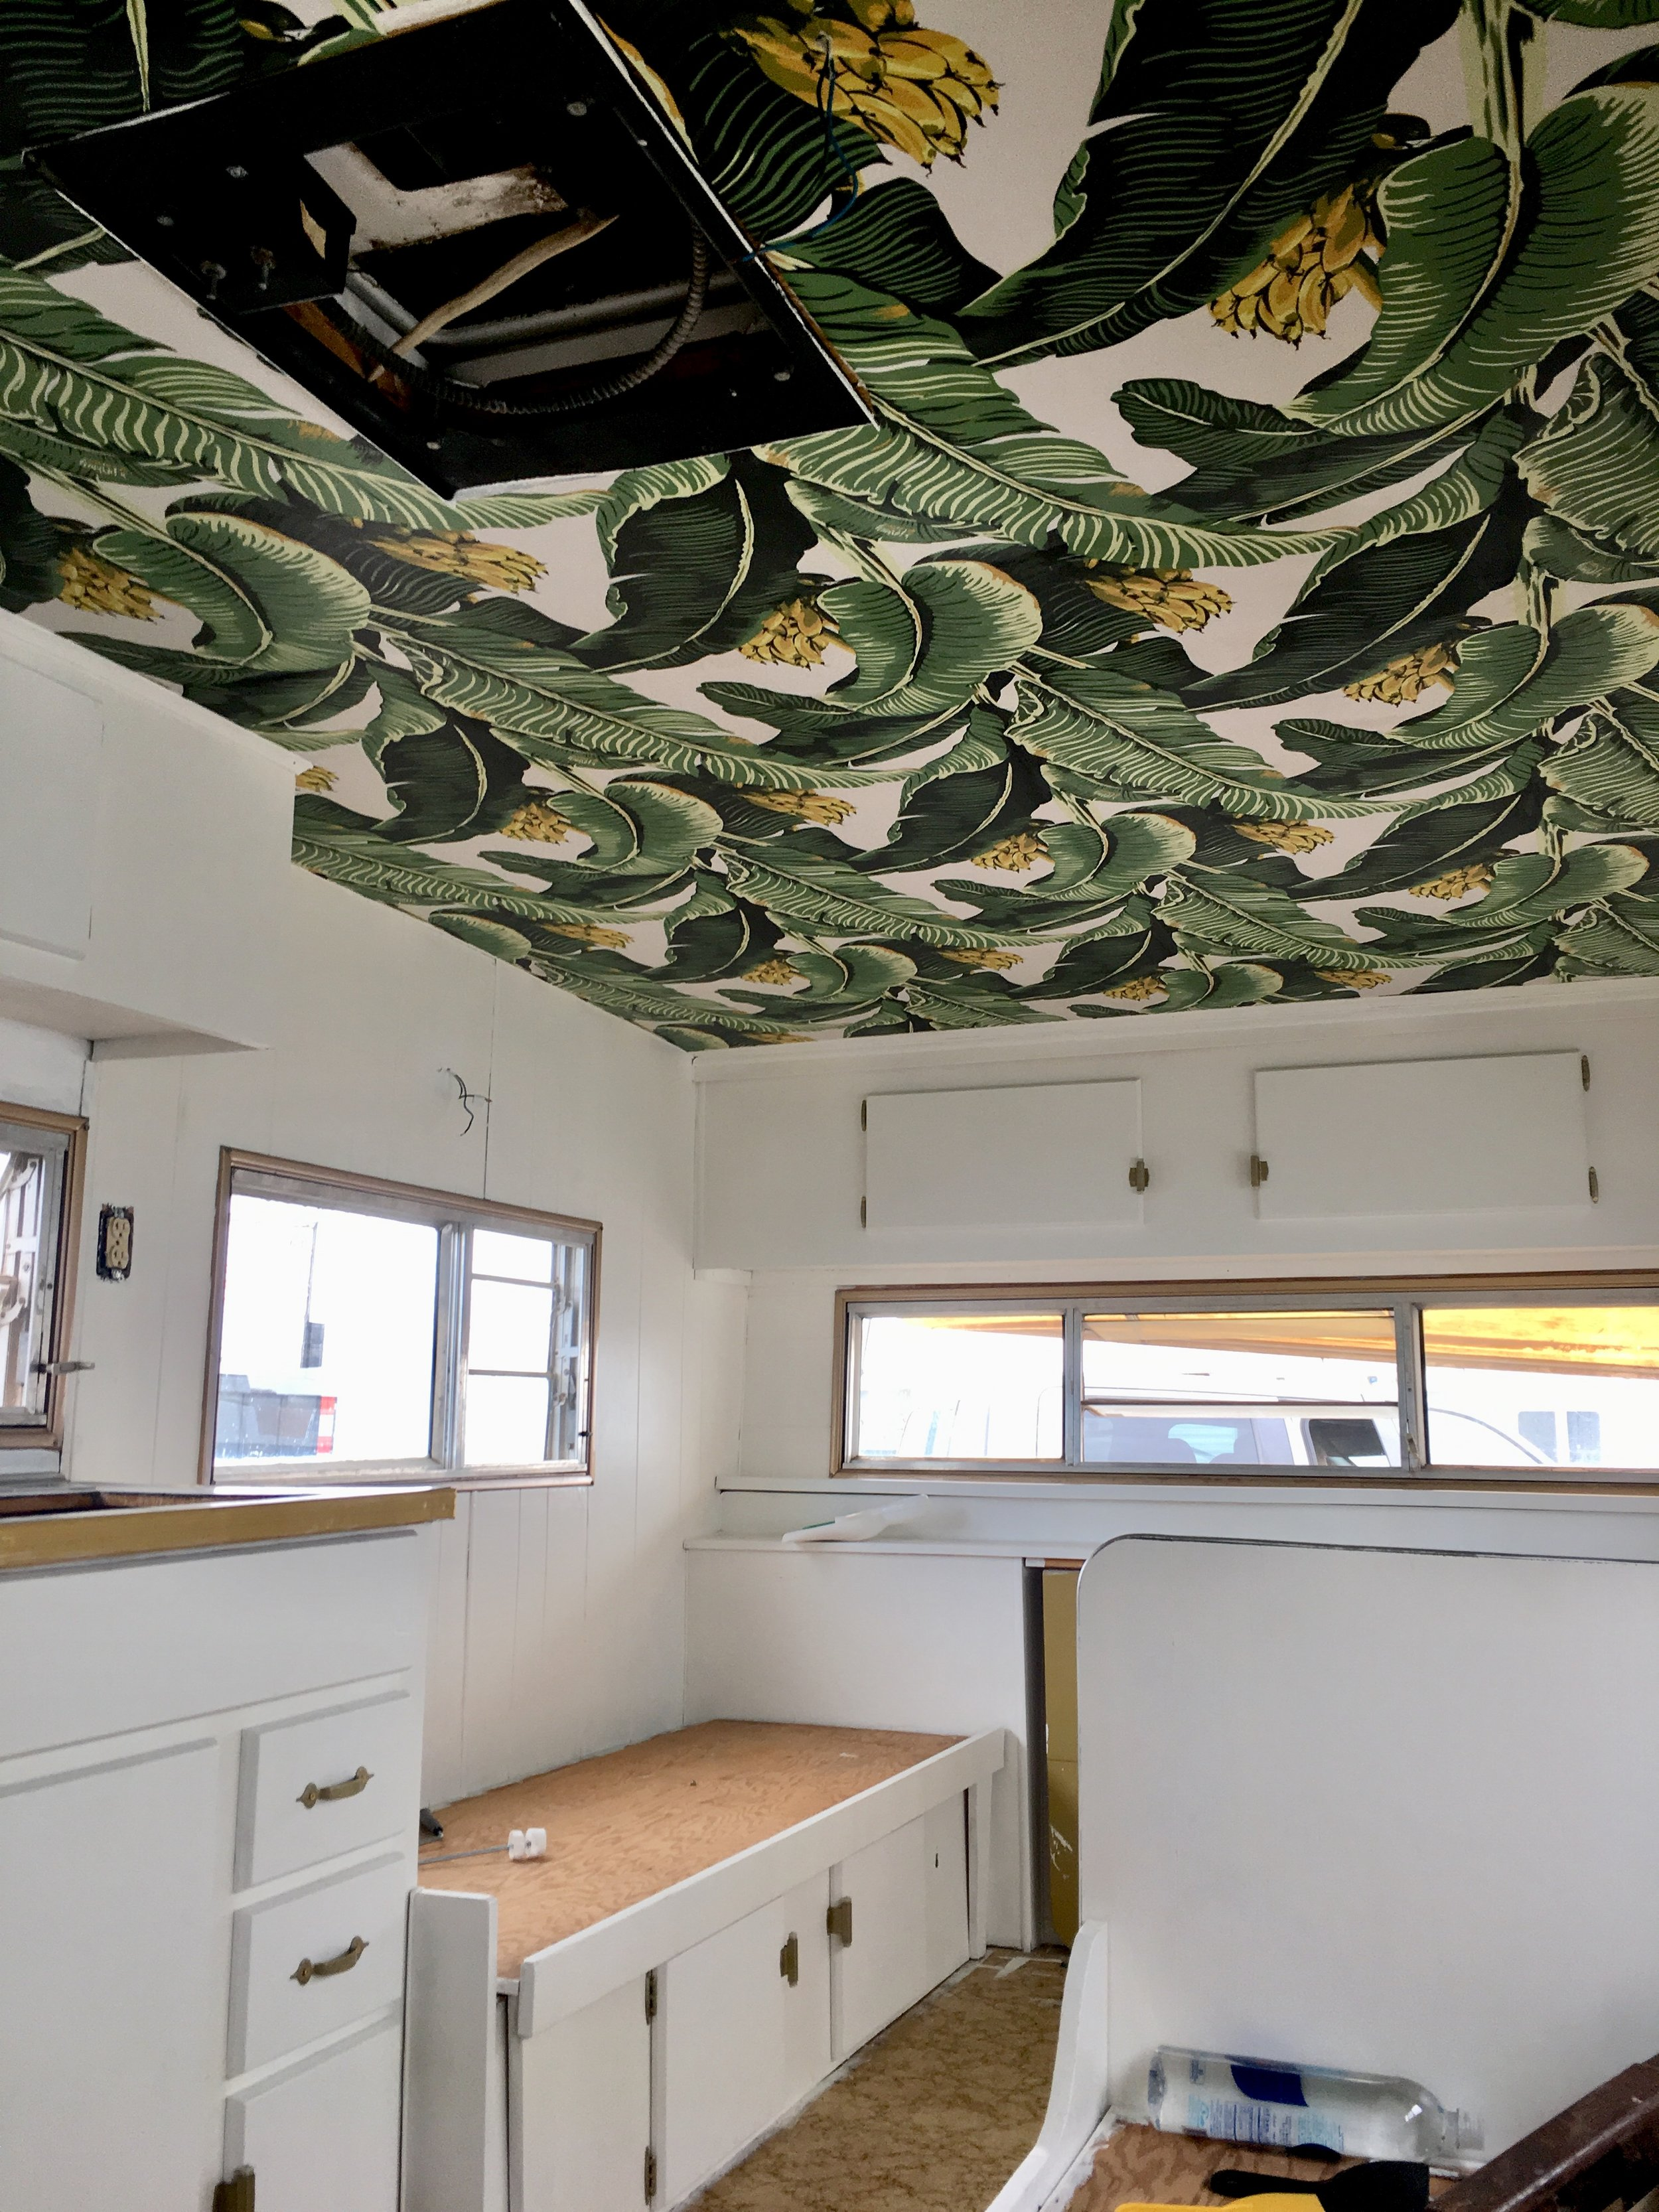 Banana wallpapered ceiling